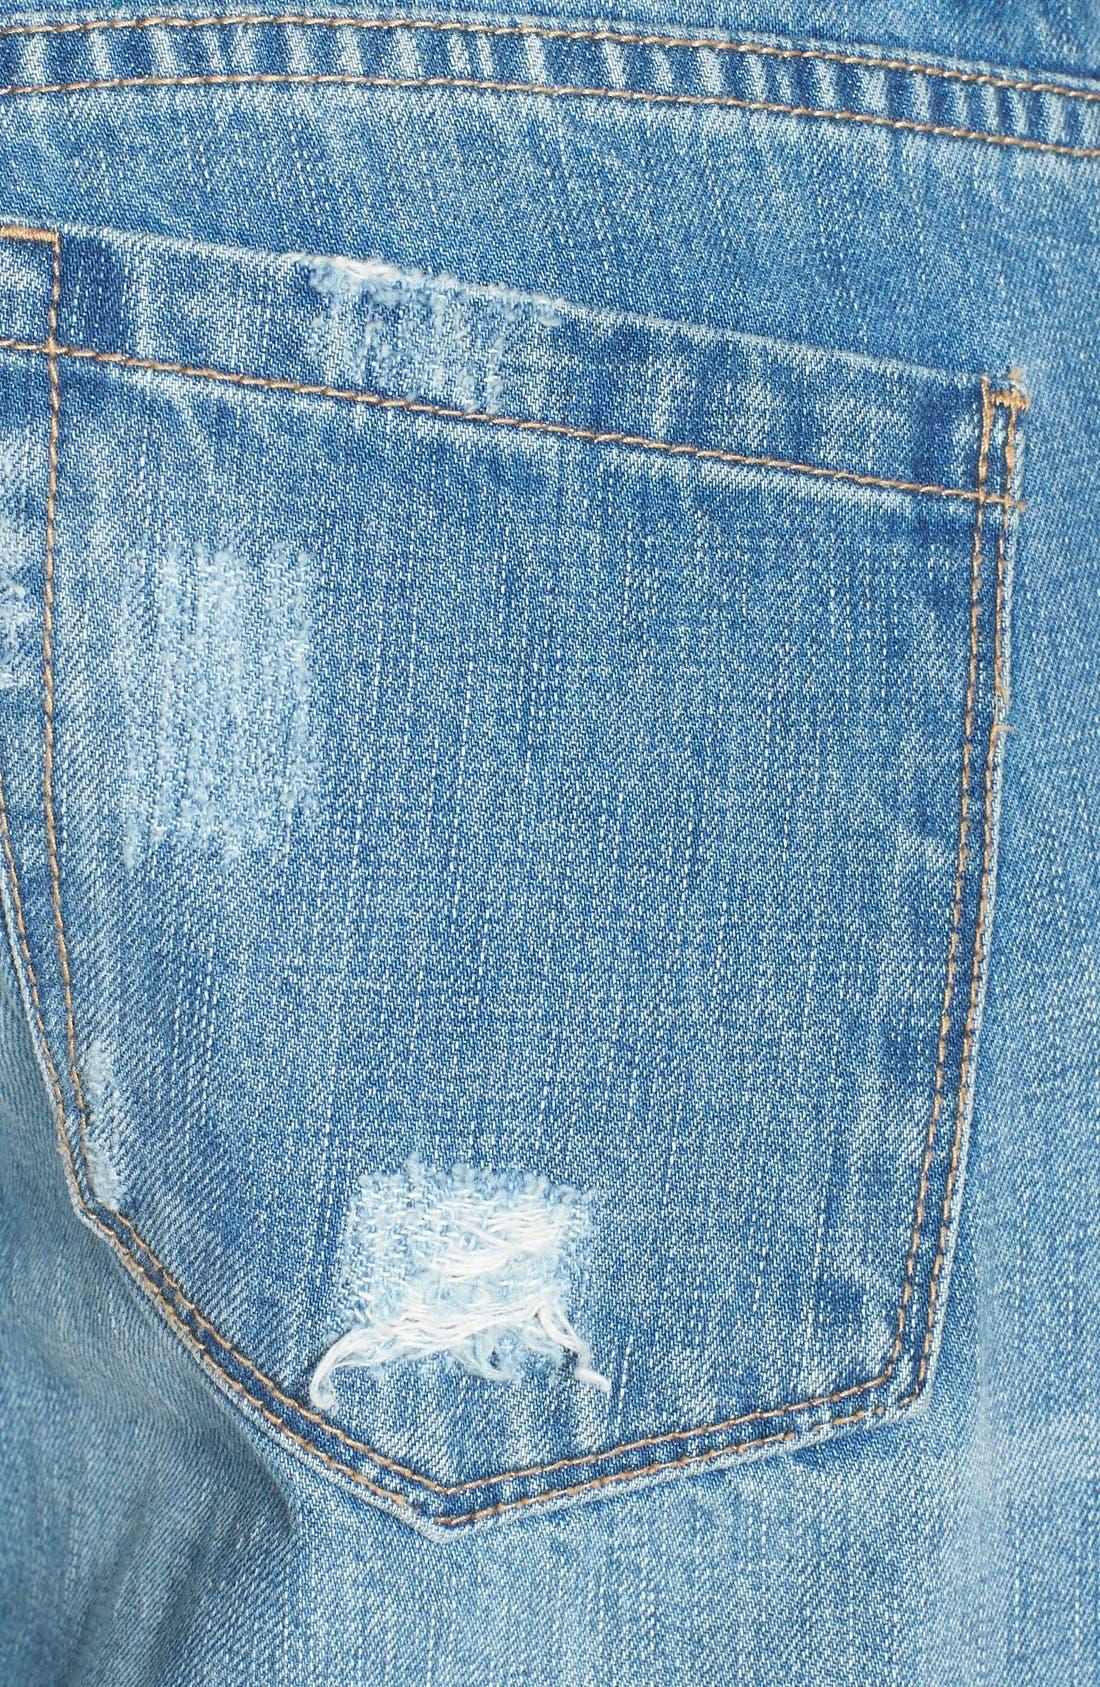 Alternate Image 3  - BLANKNYC Destroyed Boyfriend Jeans (Torn to Shreds)